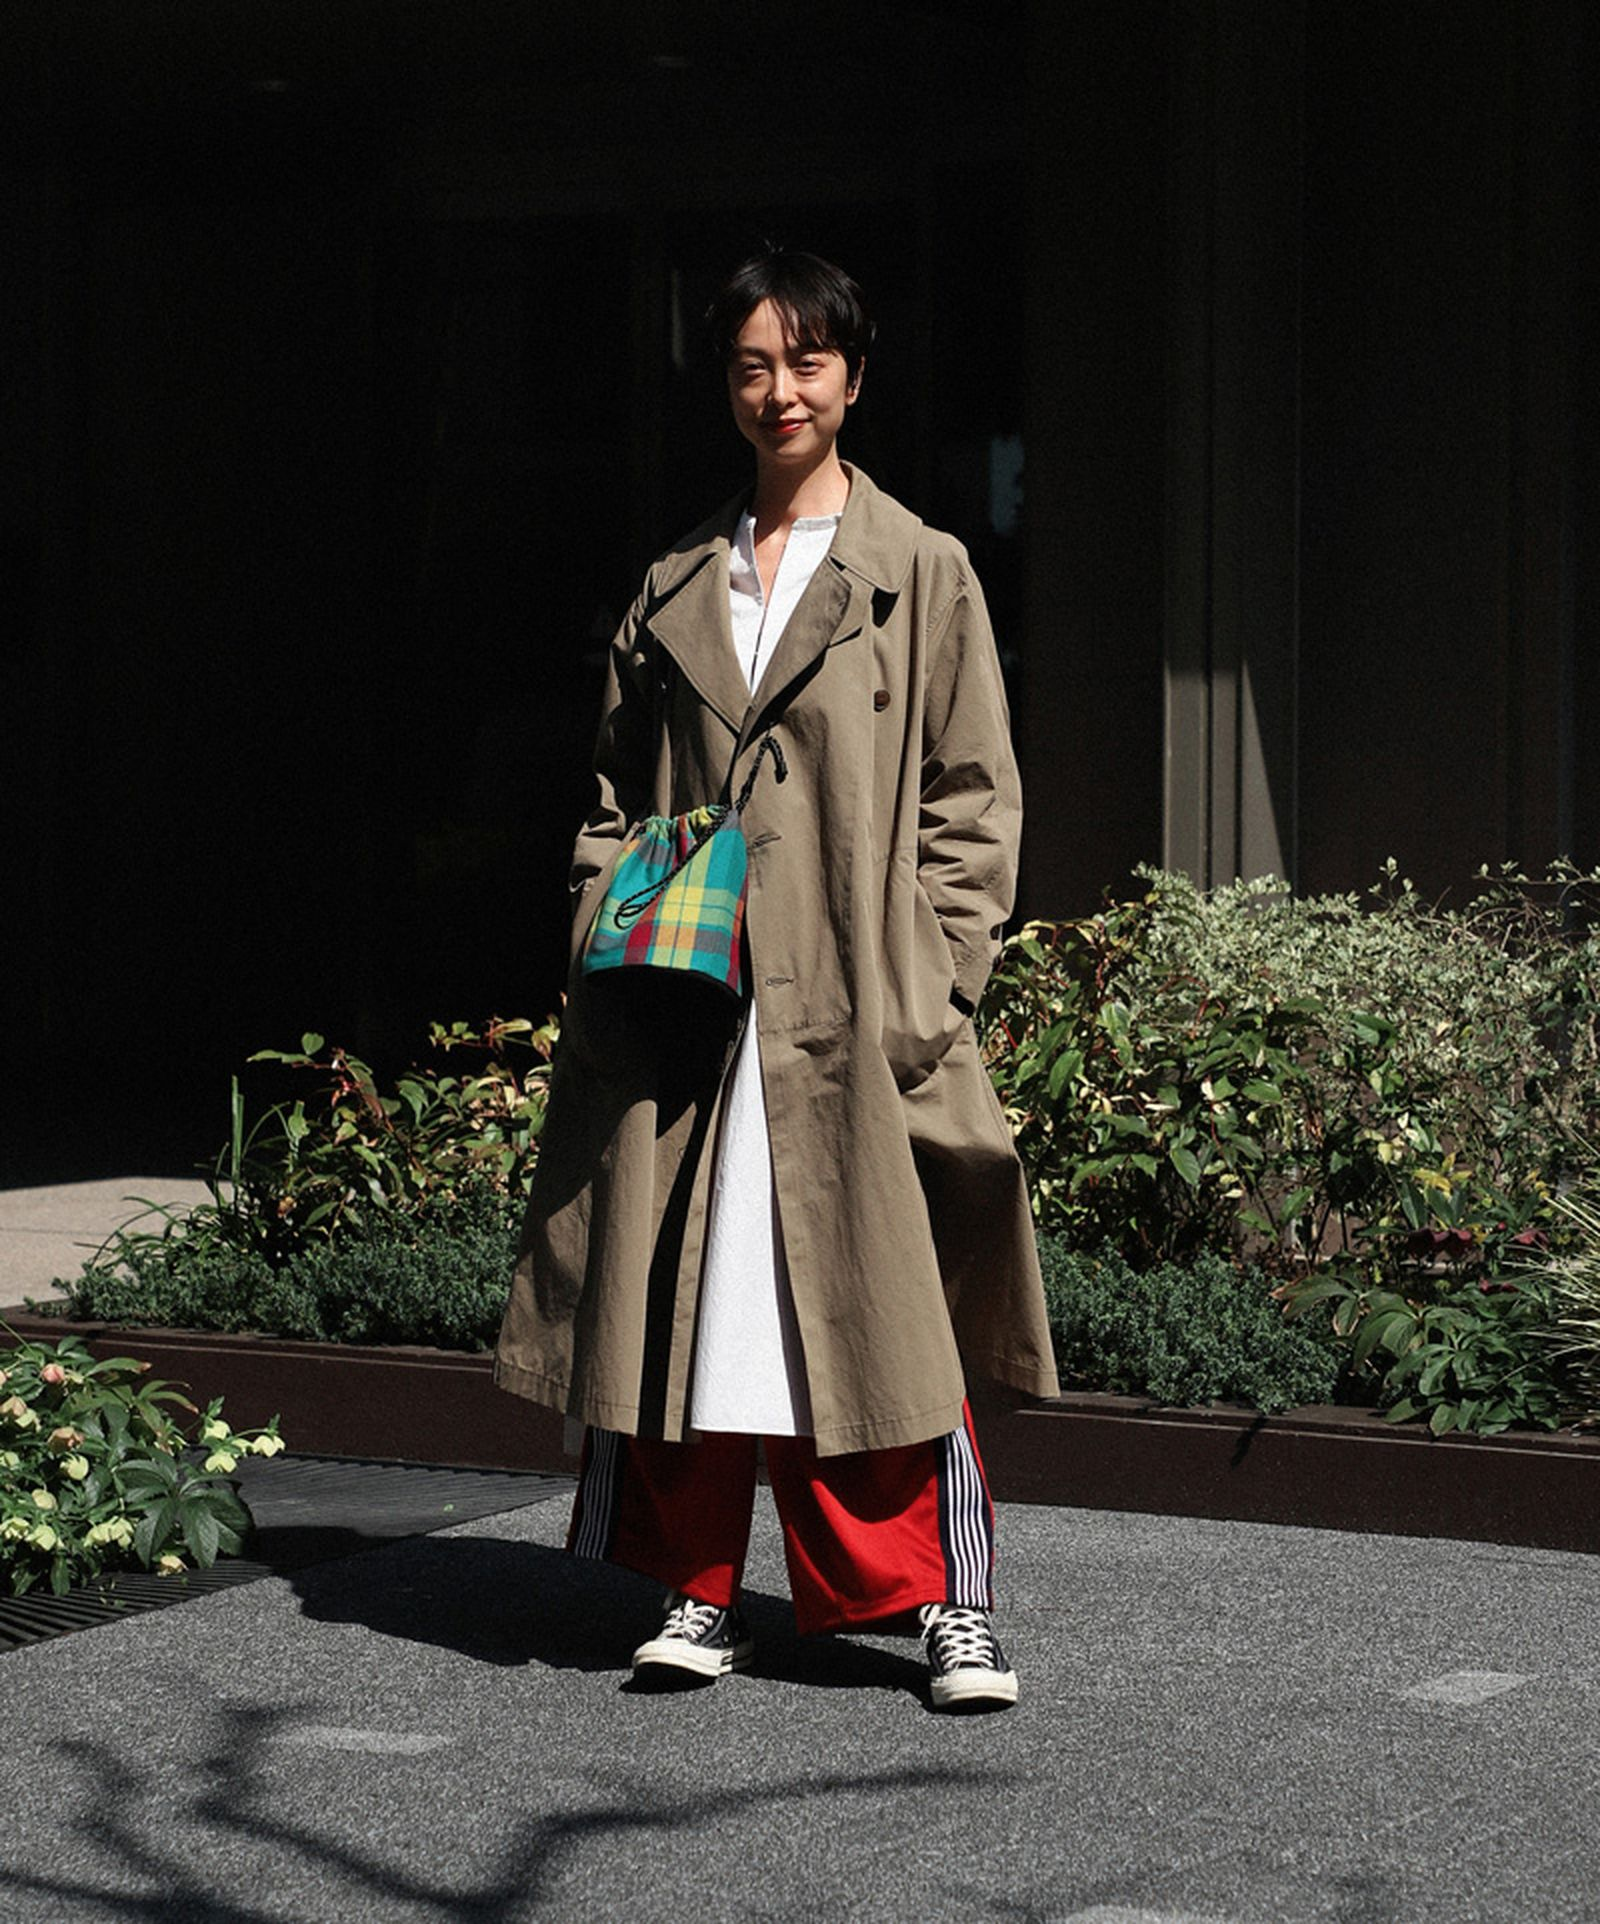 8tokyo street style march 2019 Nicolas Chalmeau